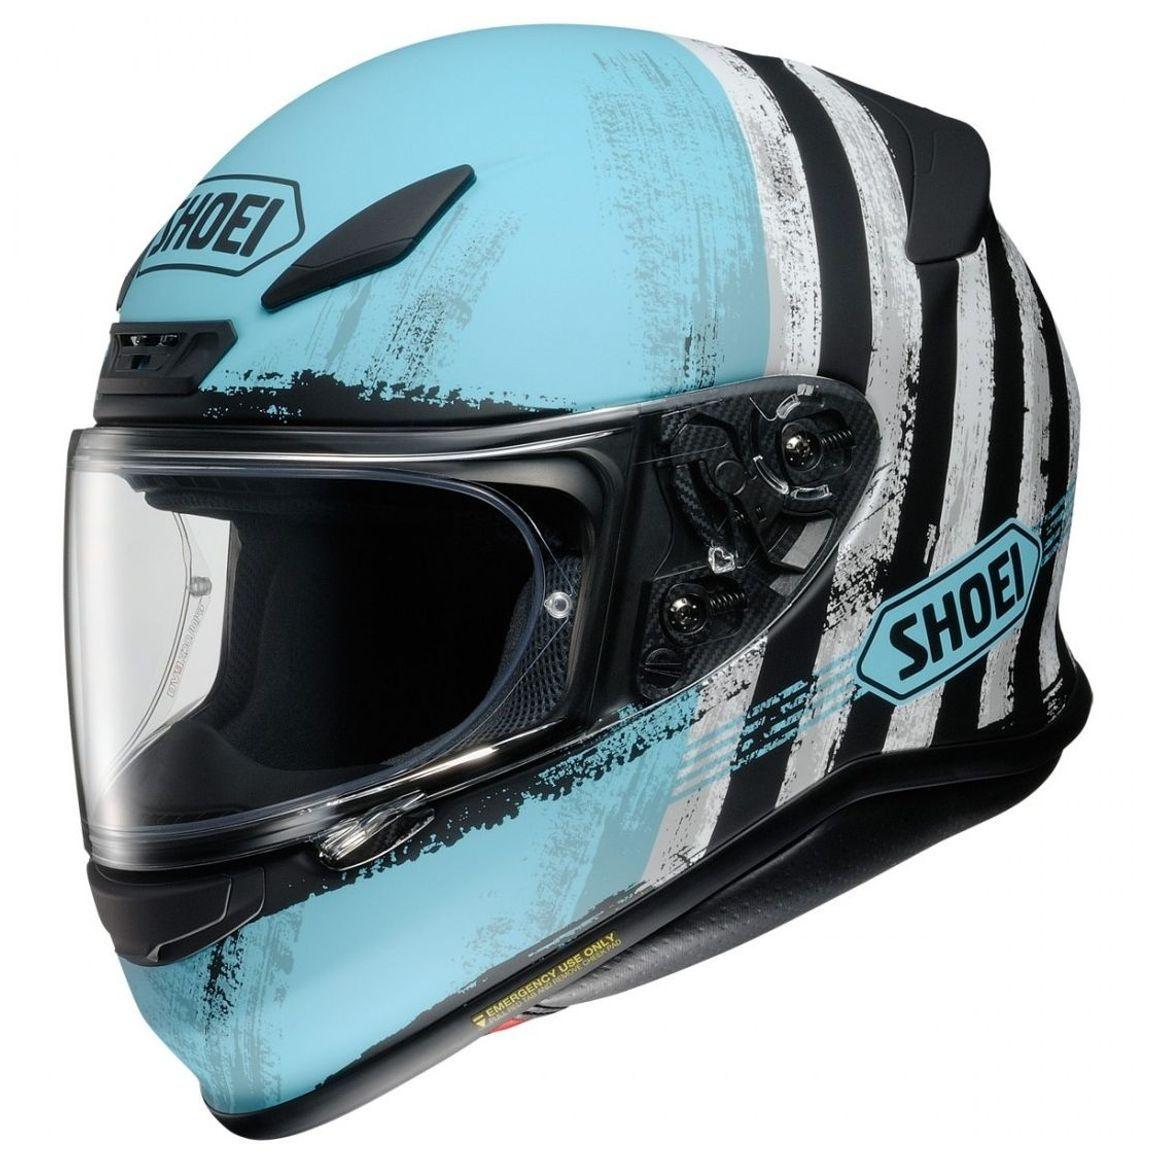 Casque Moto Shoei NXR Shorebreak TC2 - Tailles au Choix